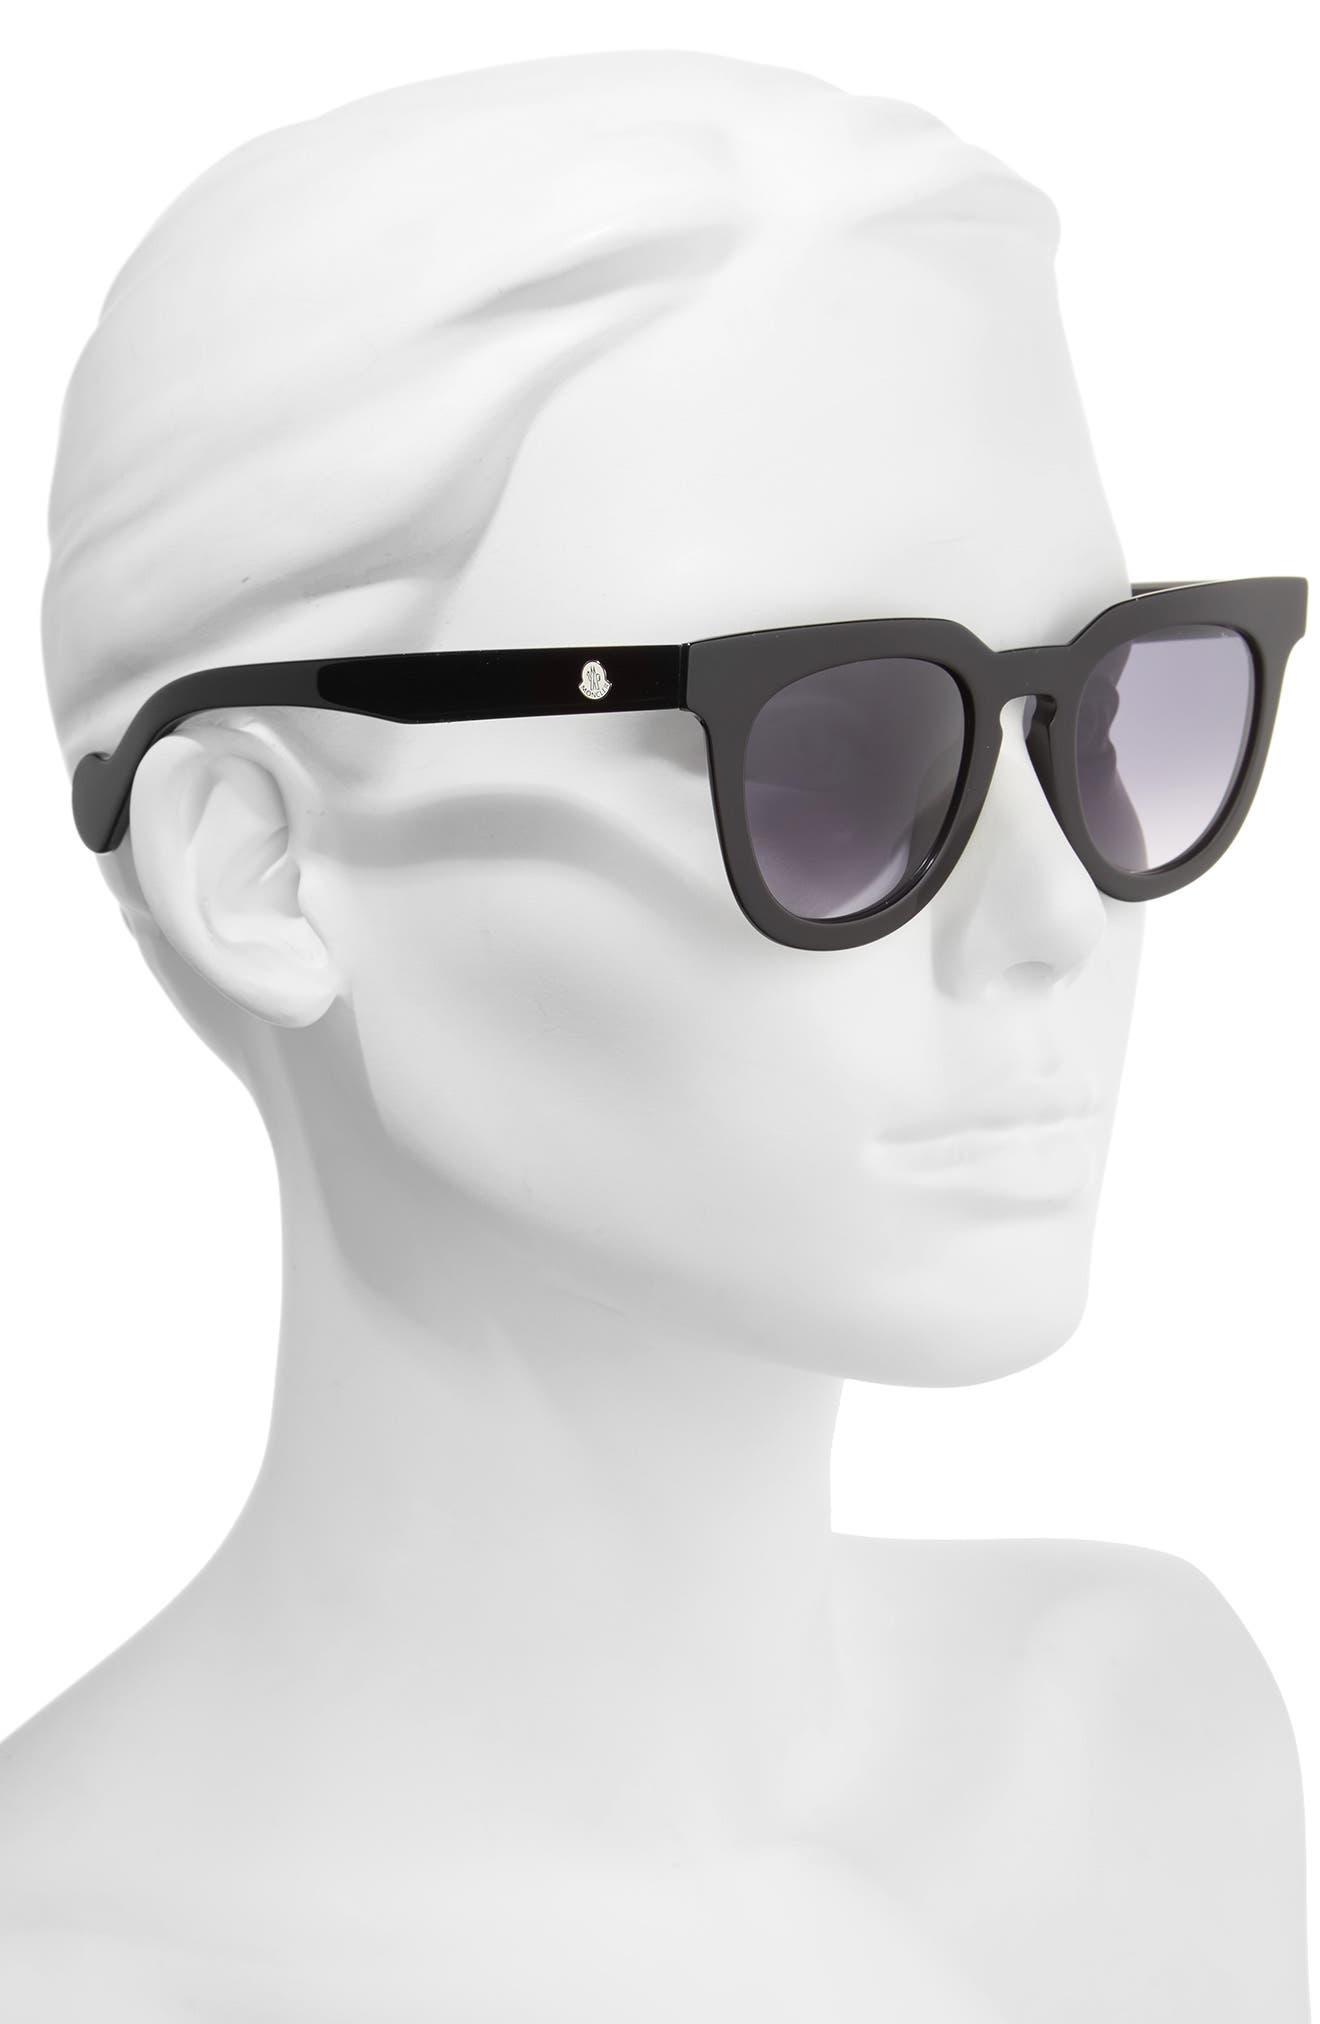 48mm Retro Sunglasses,                             Alternate thumbnail 2, color,                             001